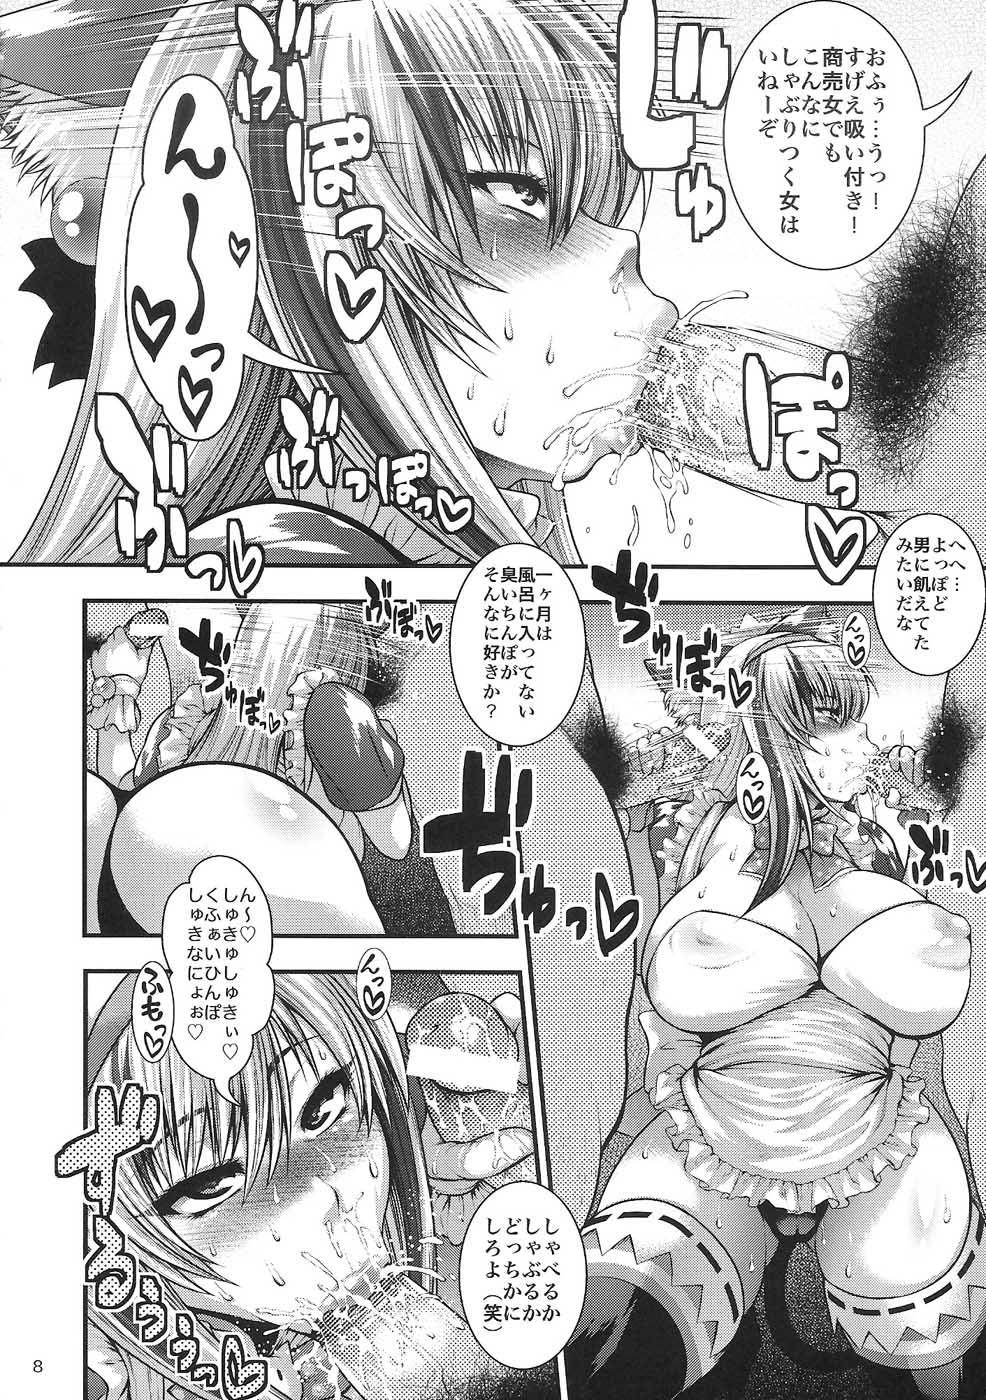 Chinpo ni Totsugeki! Denpa Hime! 6